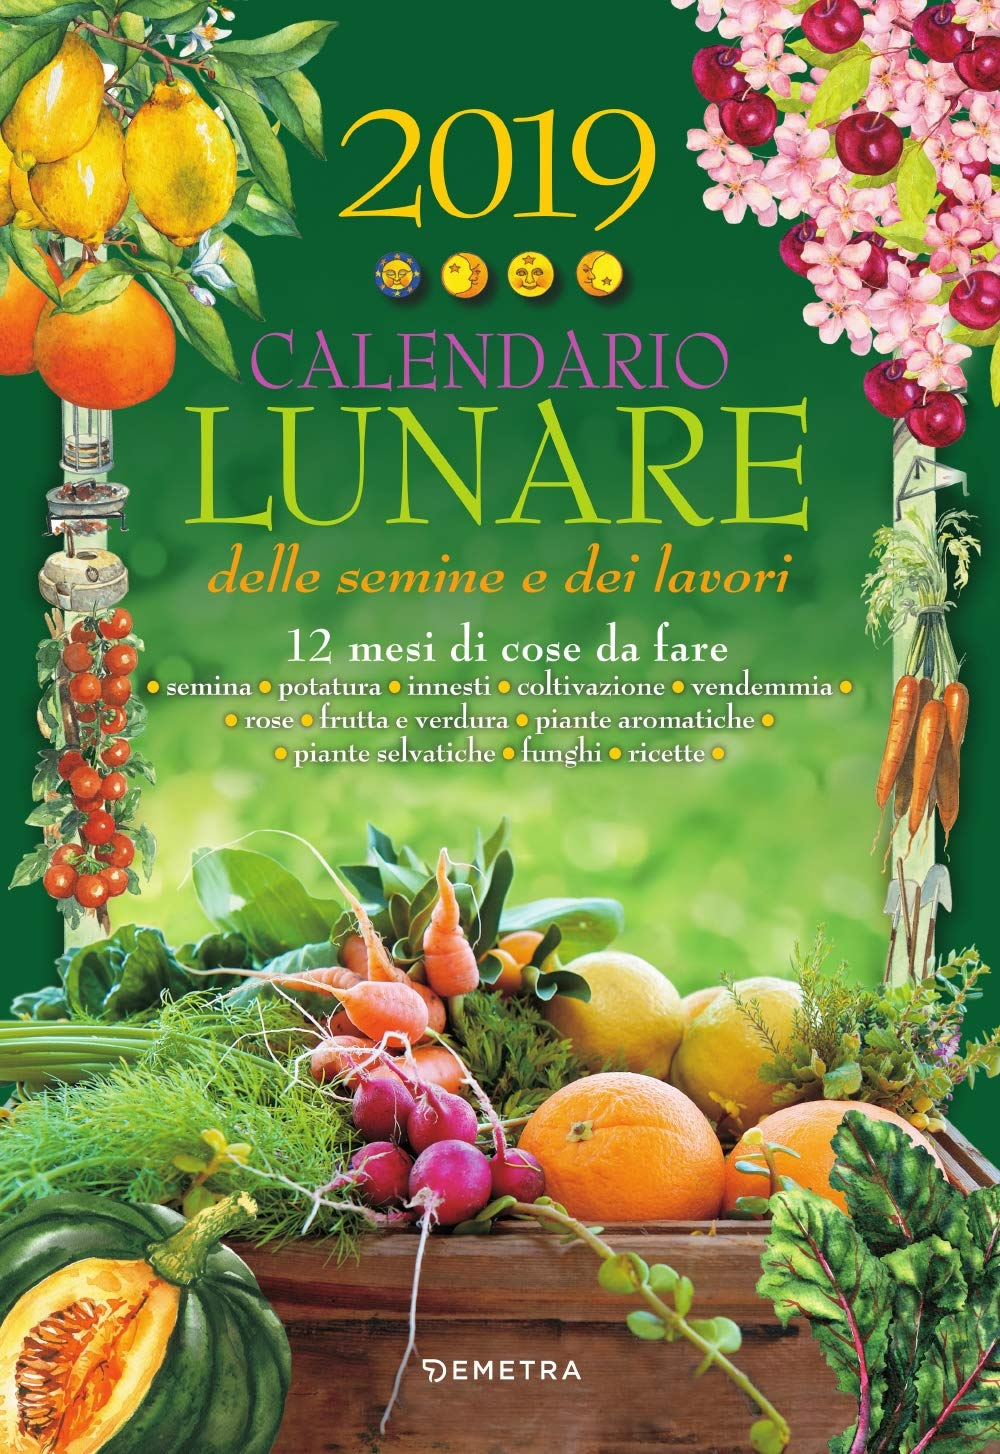 Calendario Lunare Marzo.Amazon It Calendario Lunare 2019 Aa Vv Libri